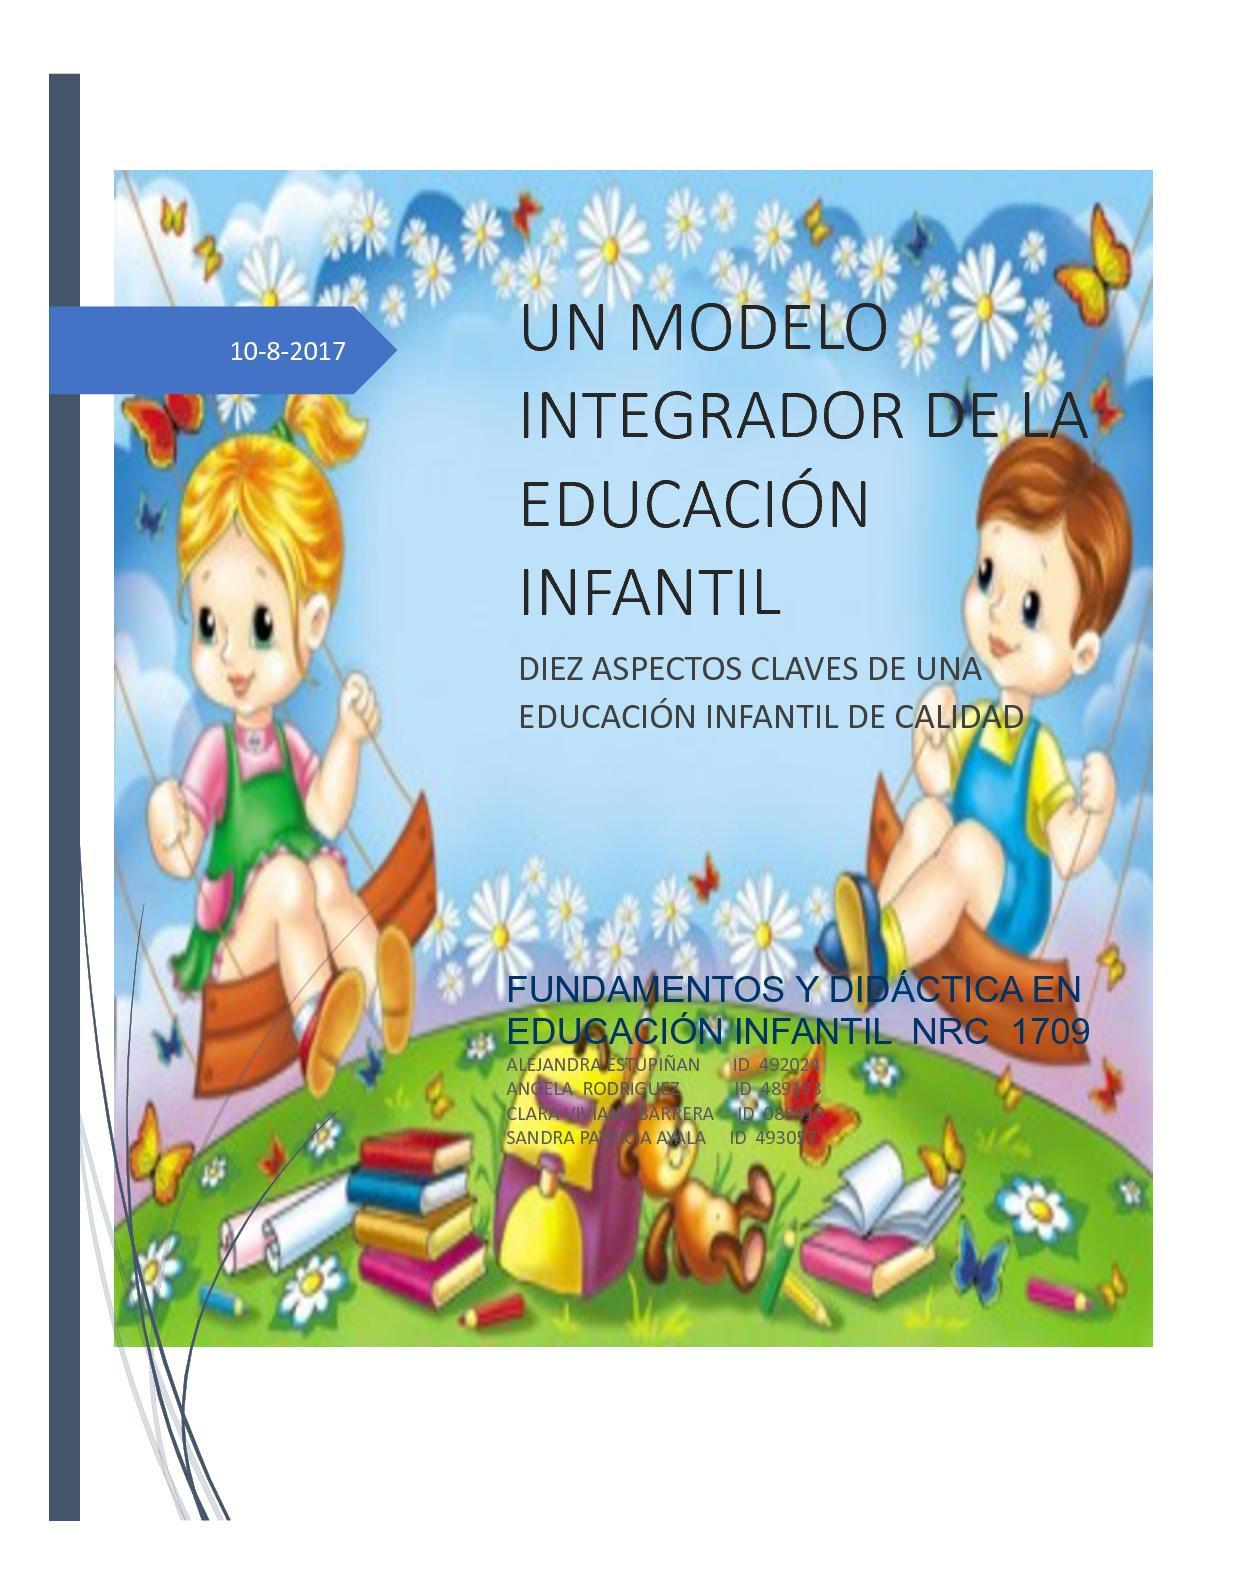 Calaméo - Un Modelo Integrador De La Educación Infantil